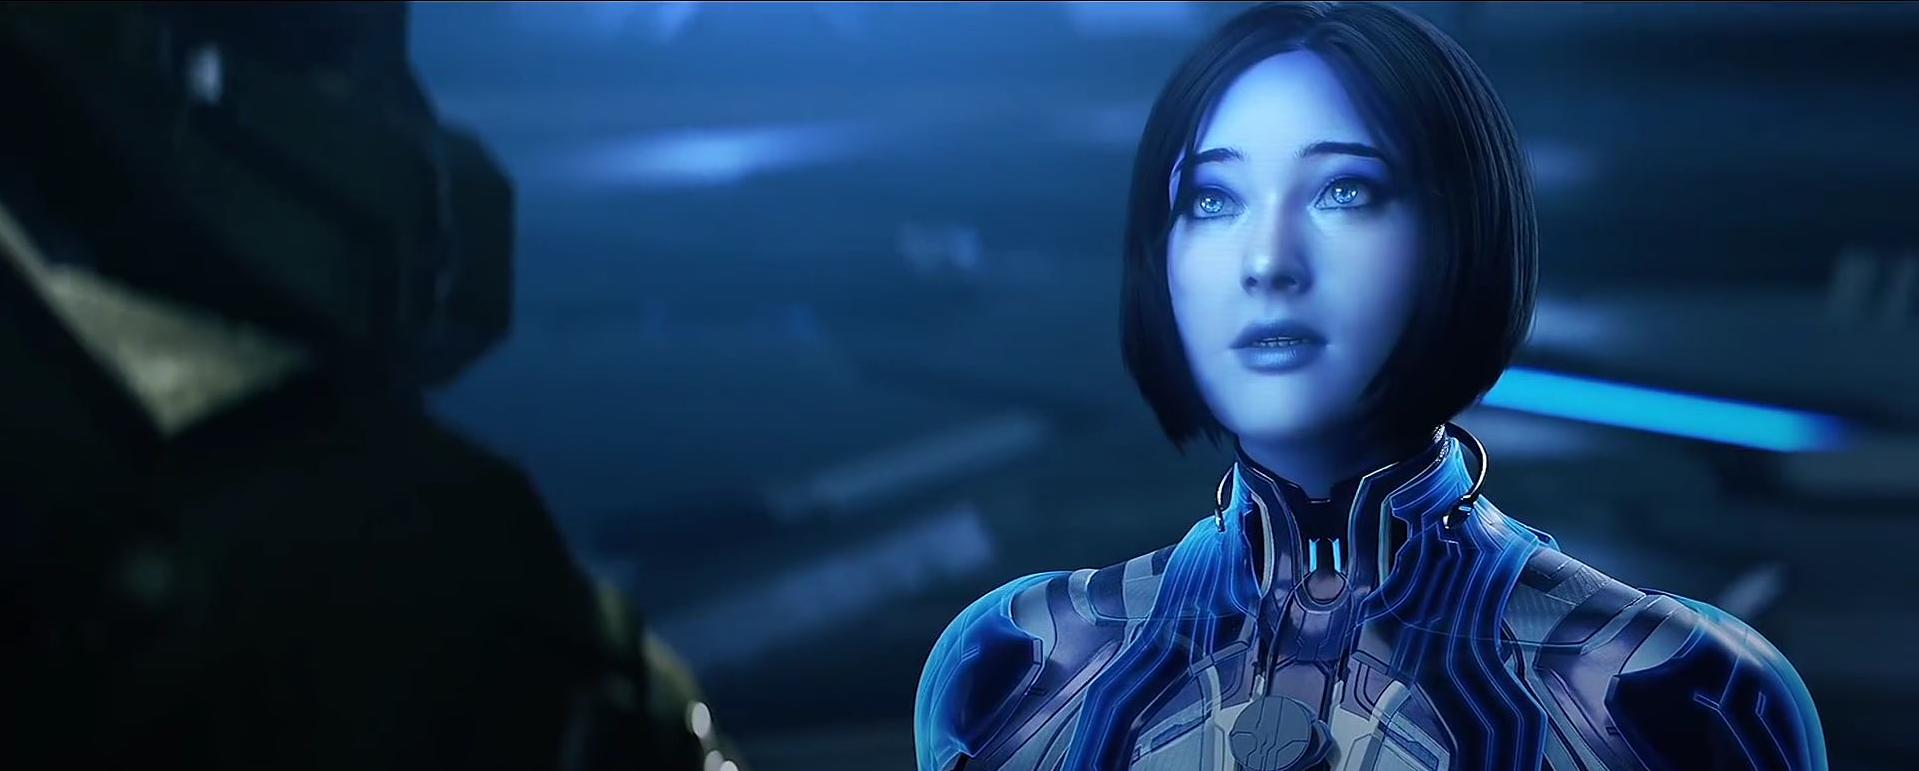 Halo 5 cortana porno hentai bizarre sexygirls